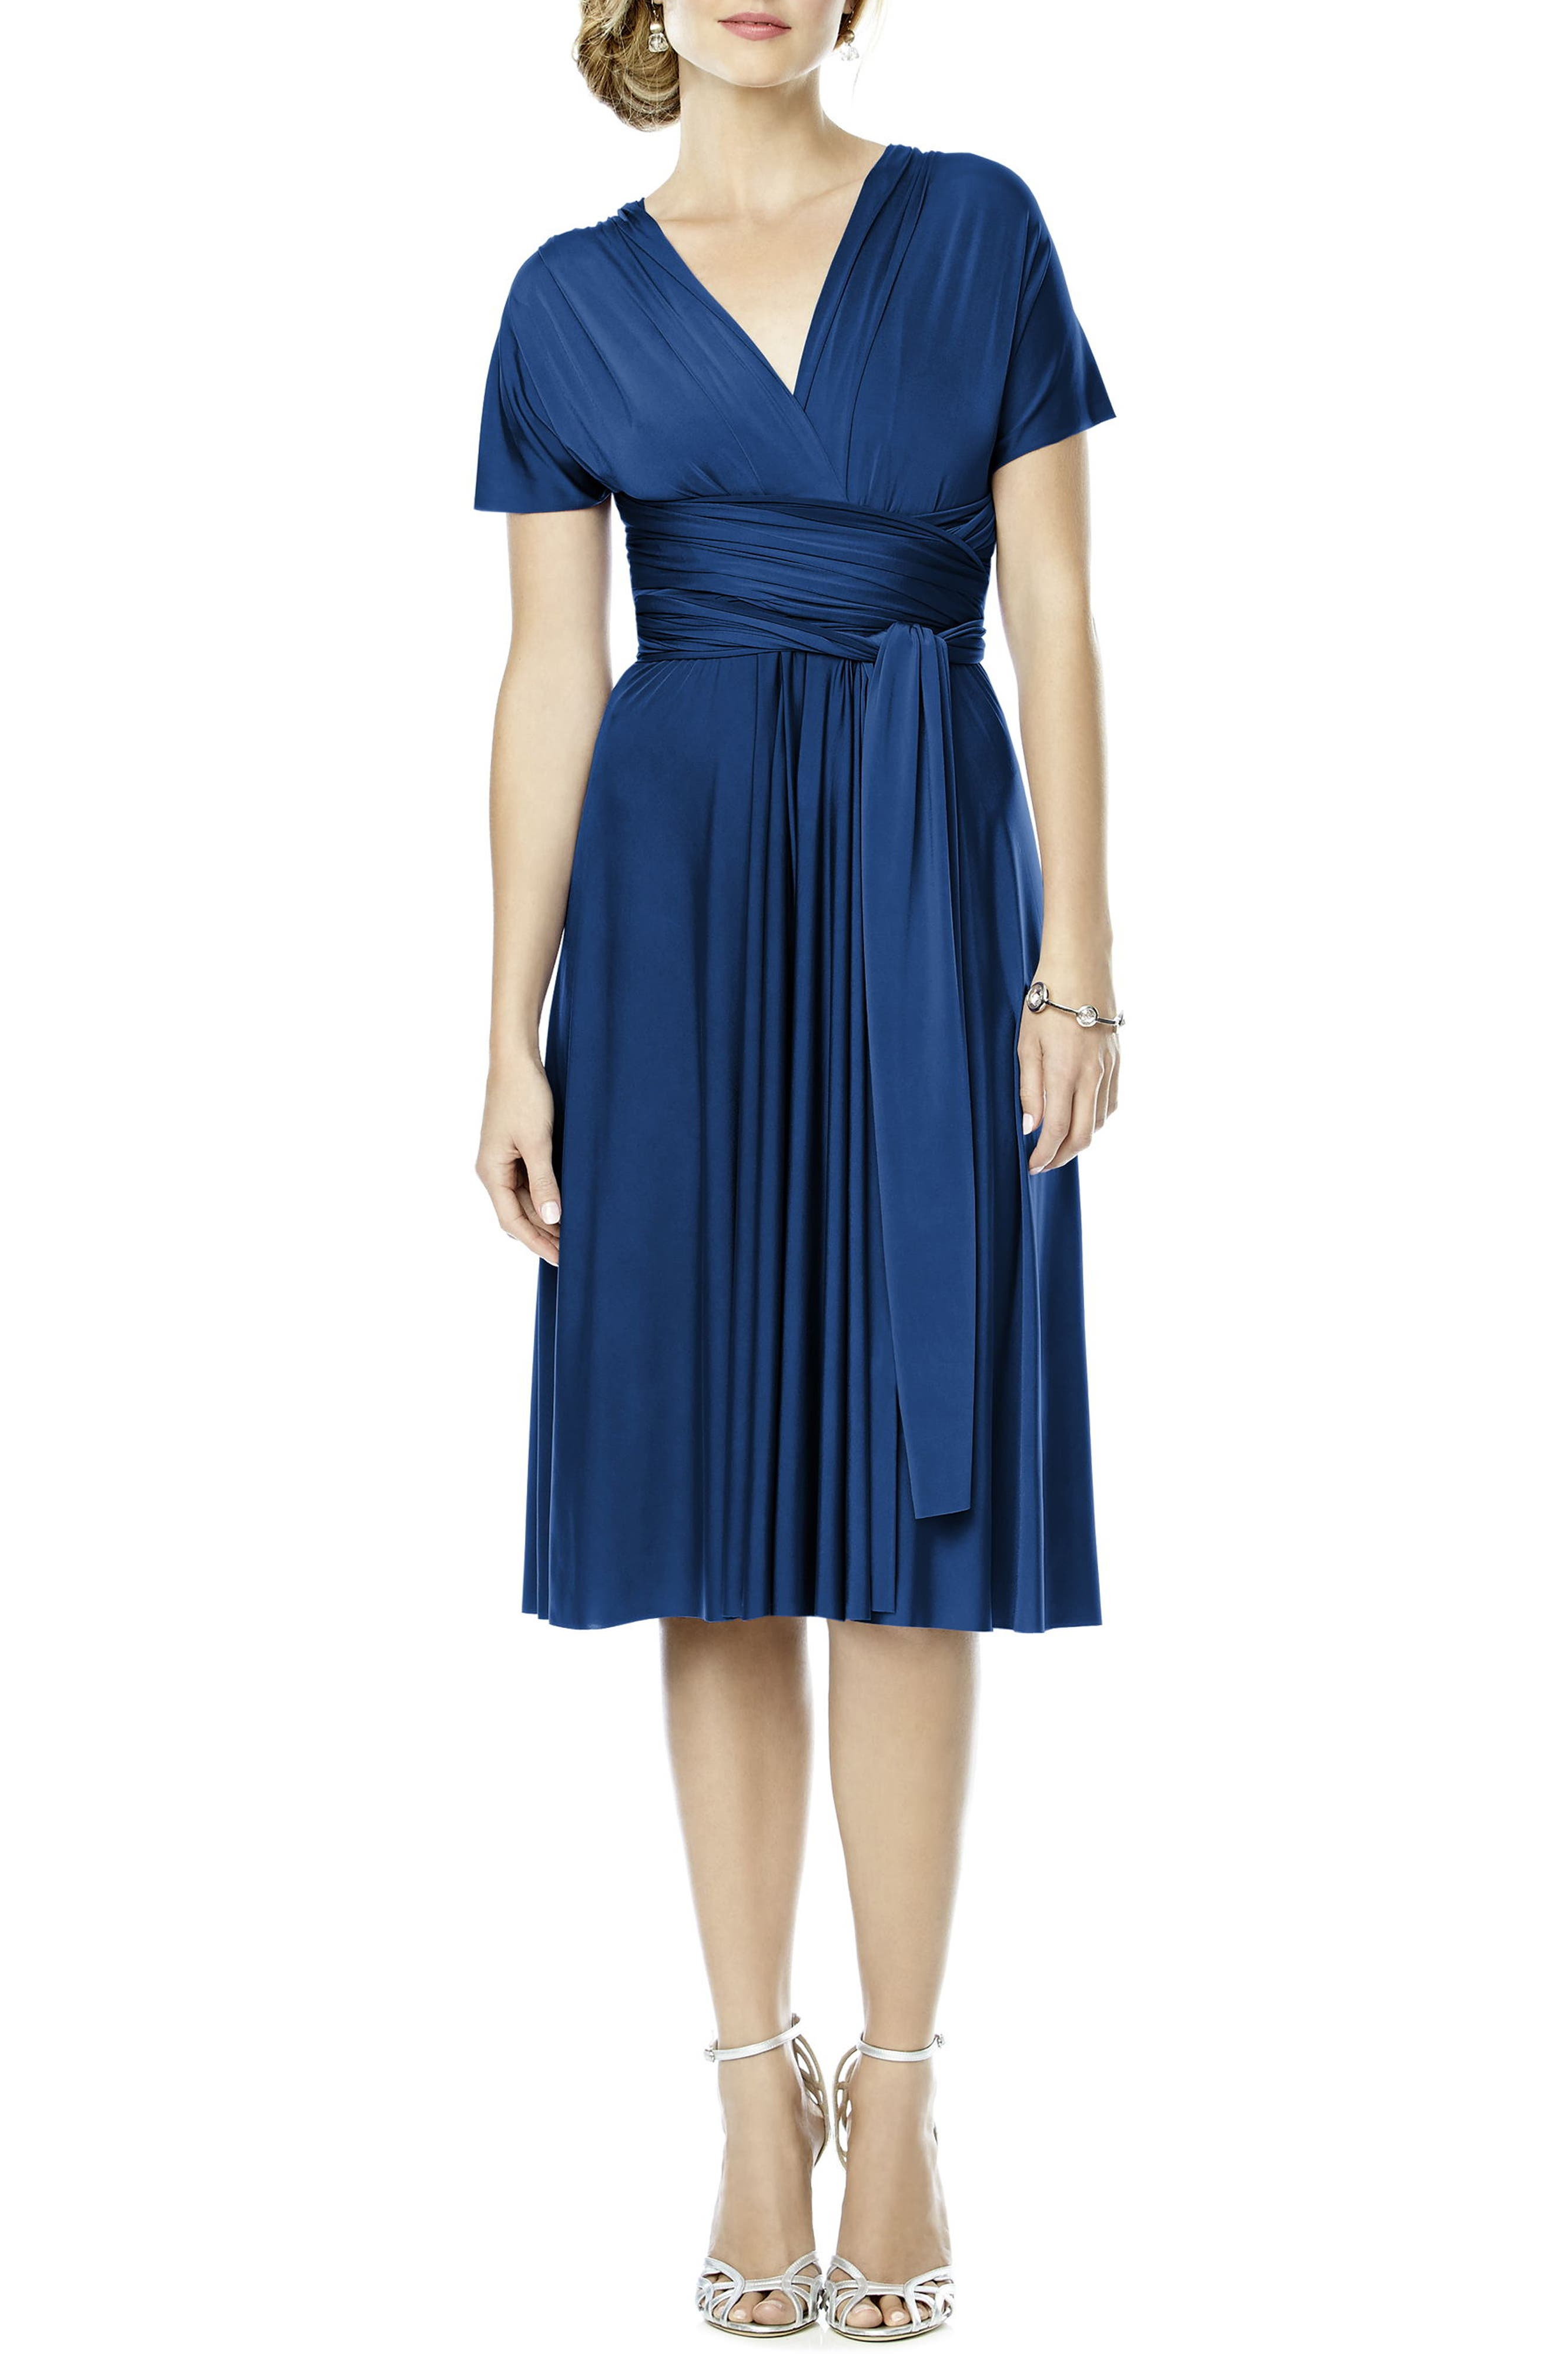 Dessy Collection Convertible Wrap Tie Surplice Jersey Dress, Blue